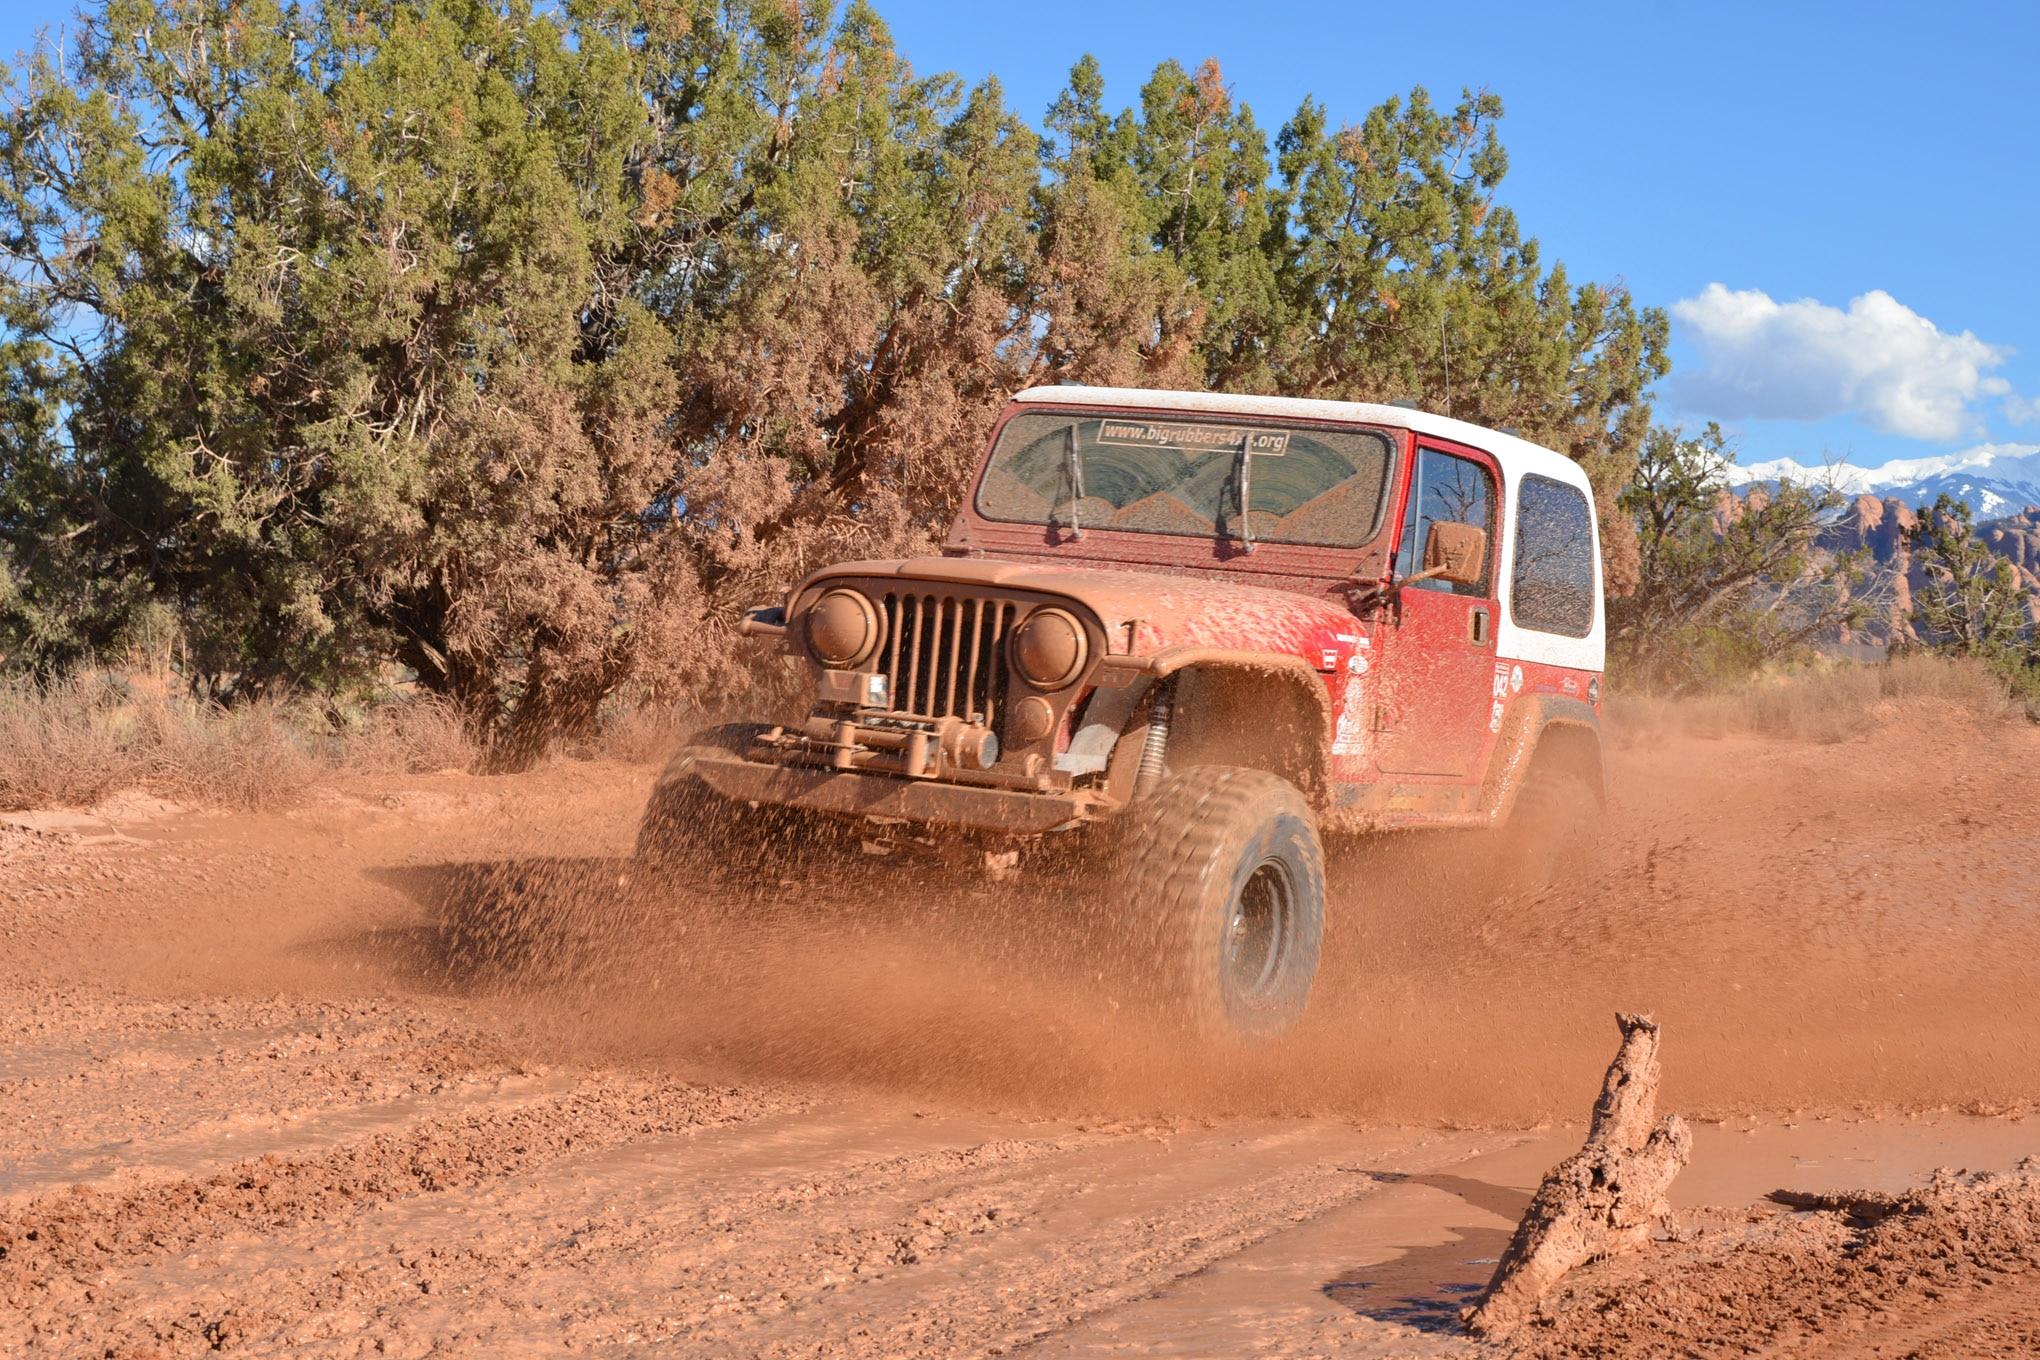 001 cooper sst pro tire test follow up mud runner cj7 lead